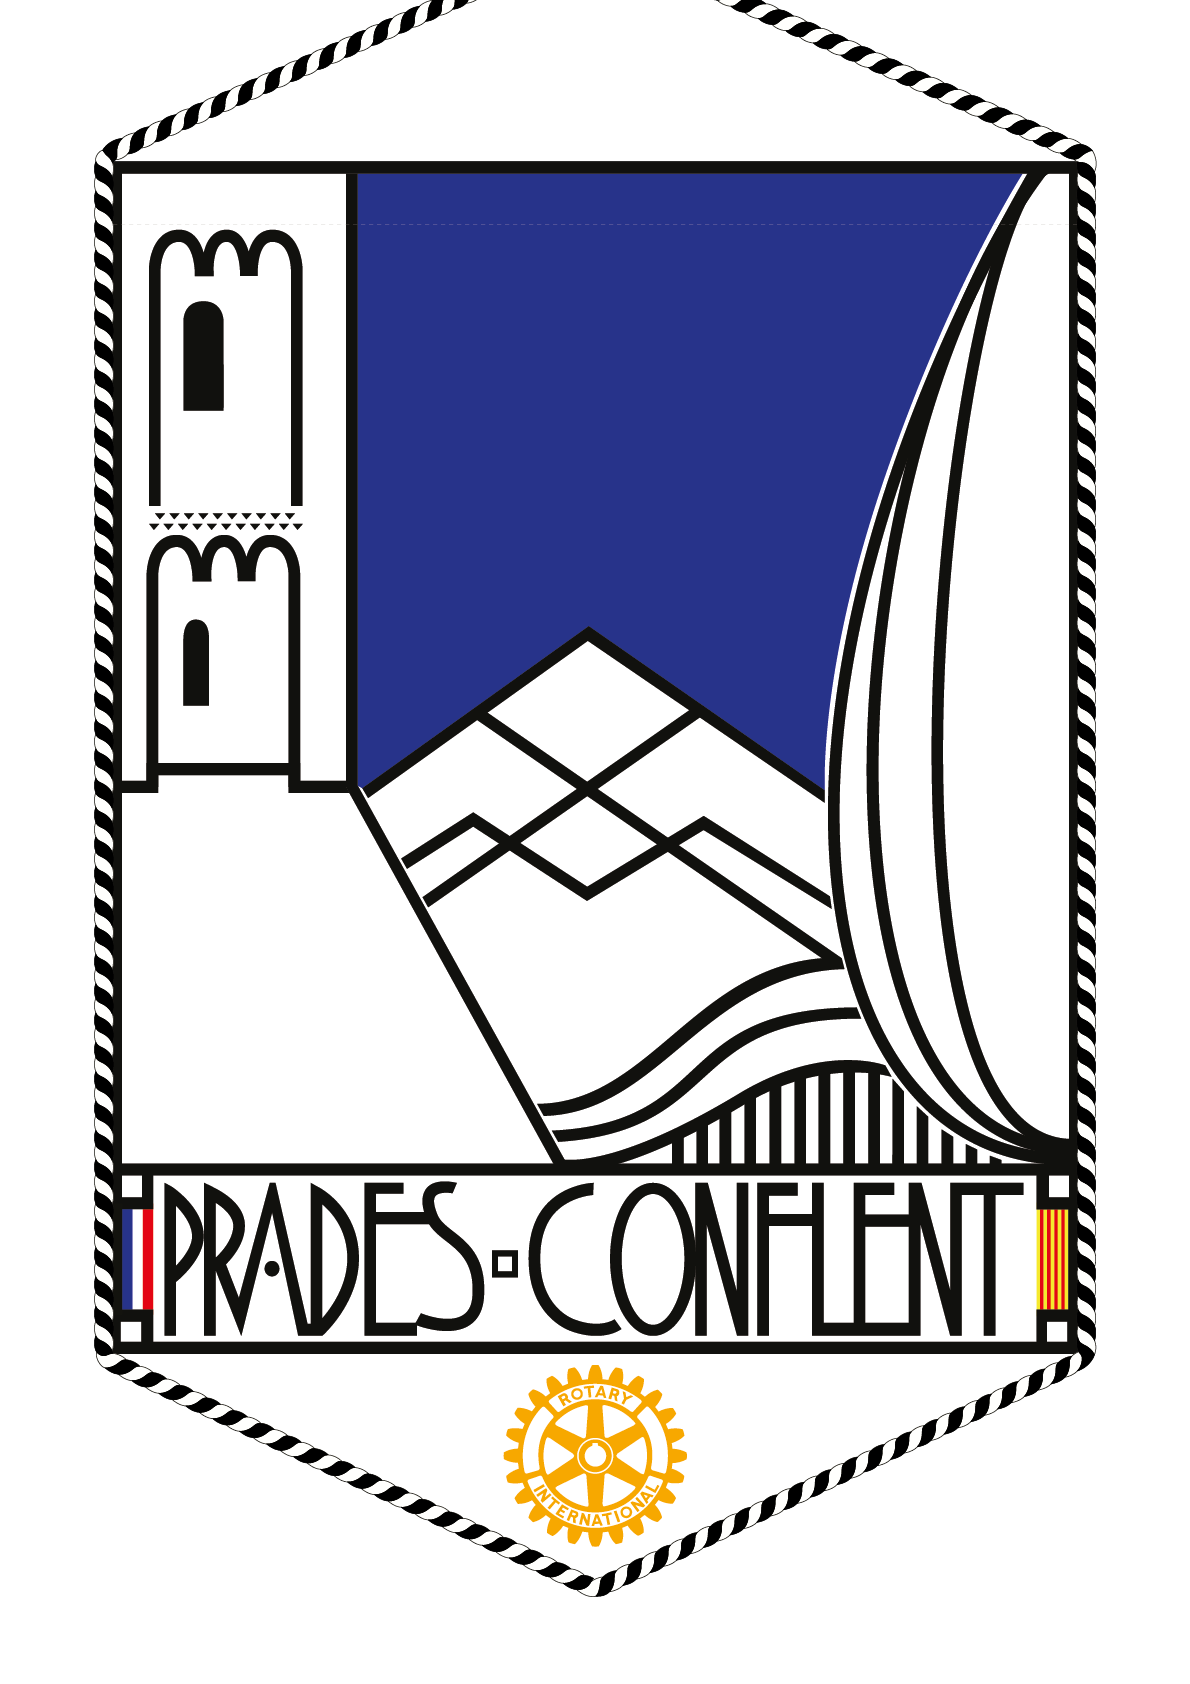 FANION ROTARY CLUB PRADES CONFLENT